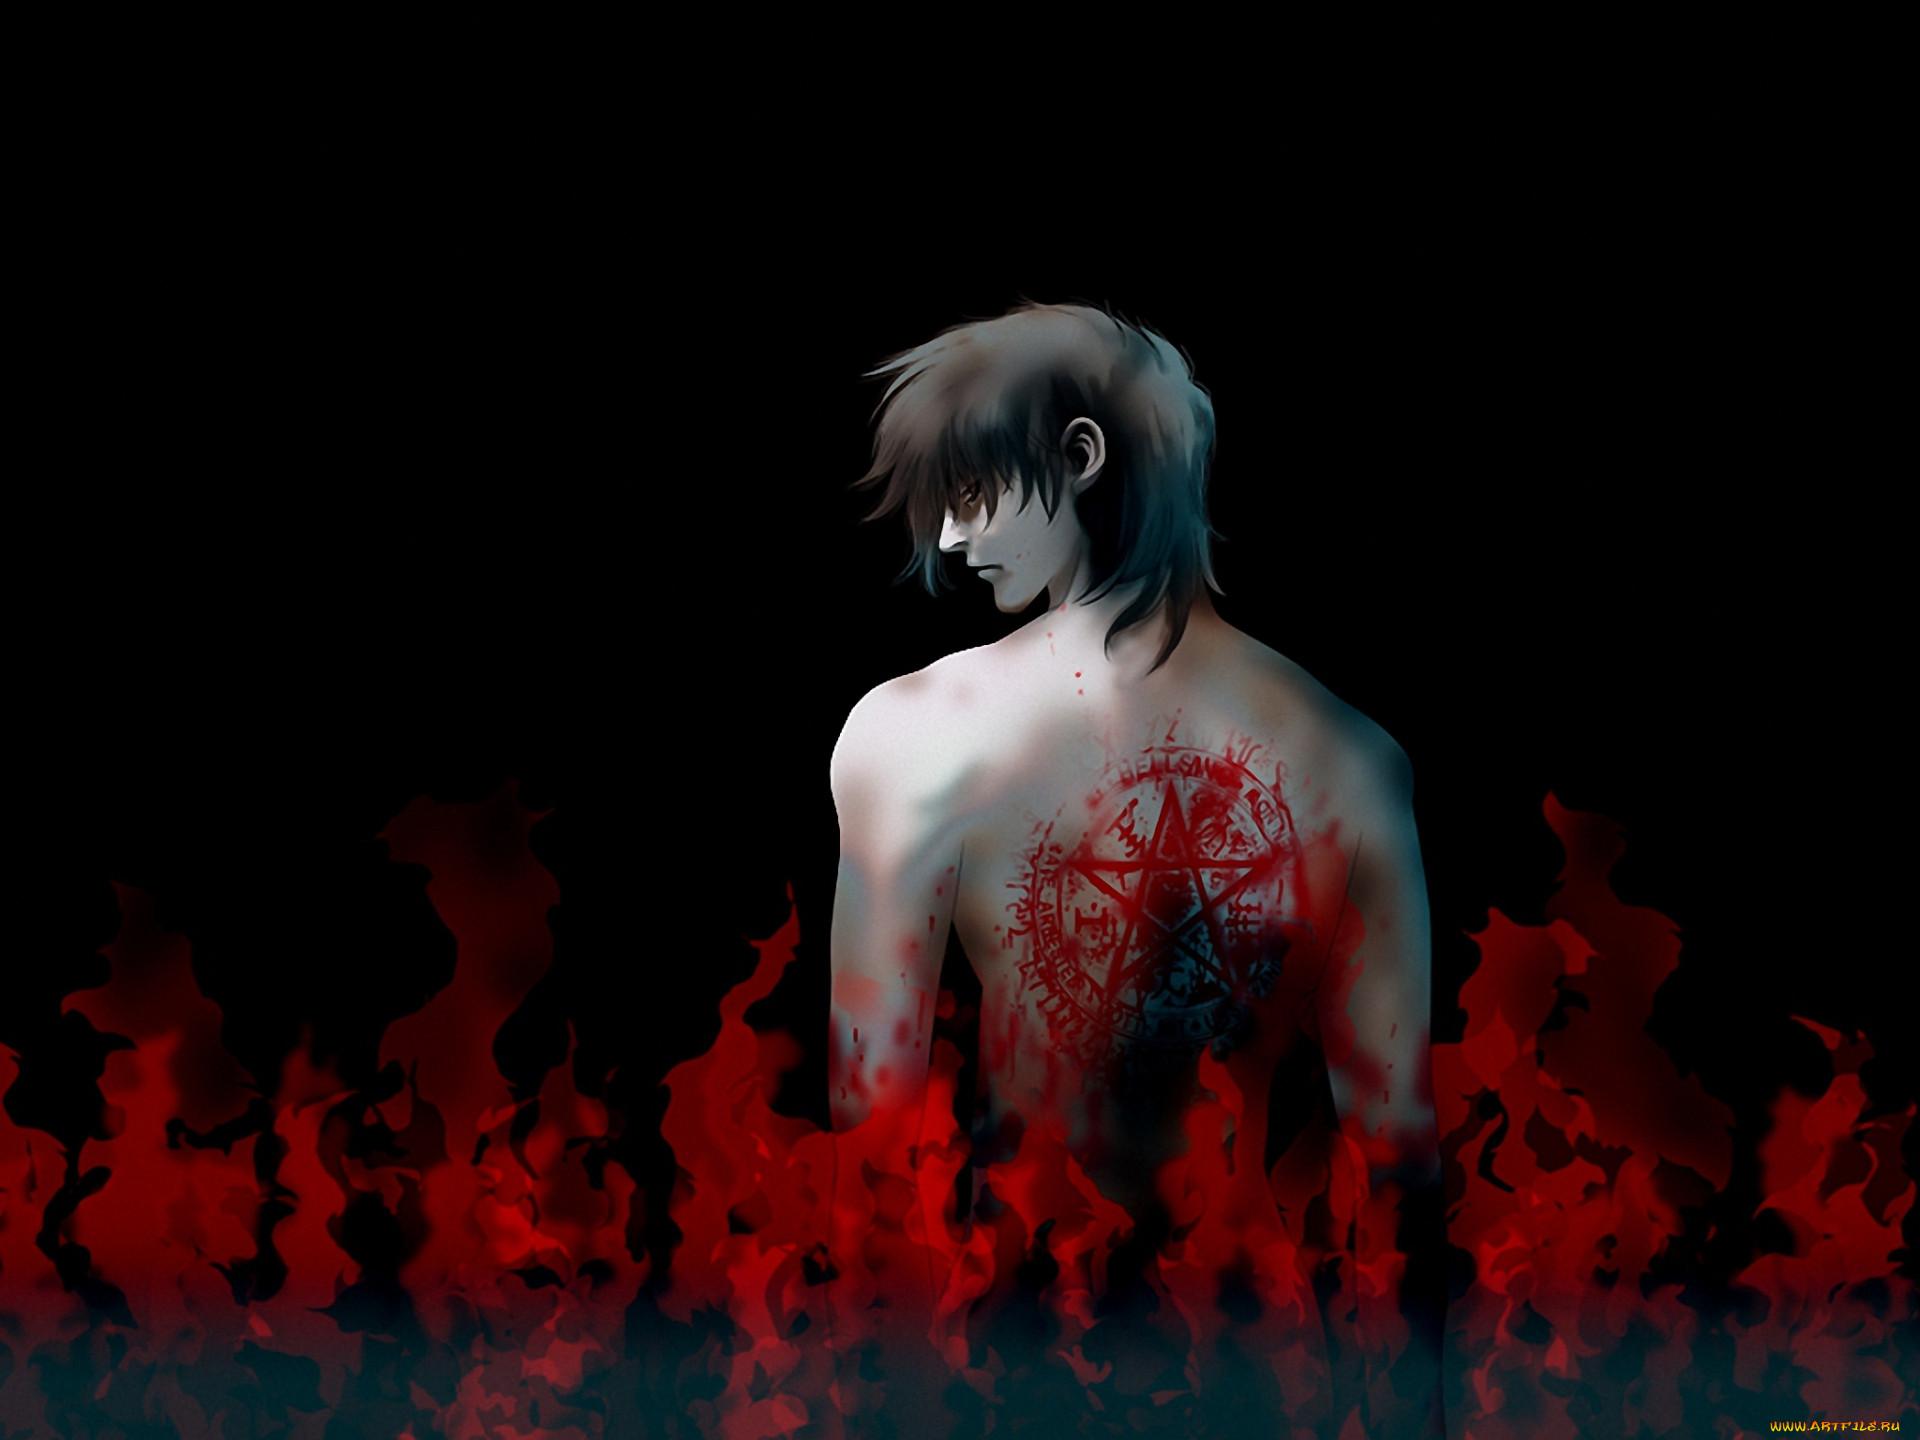 аниме, hellsing, алукард, alucard, дракула, вампир, dracula